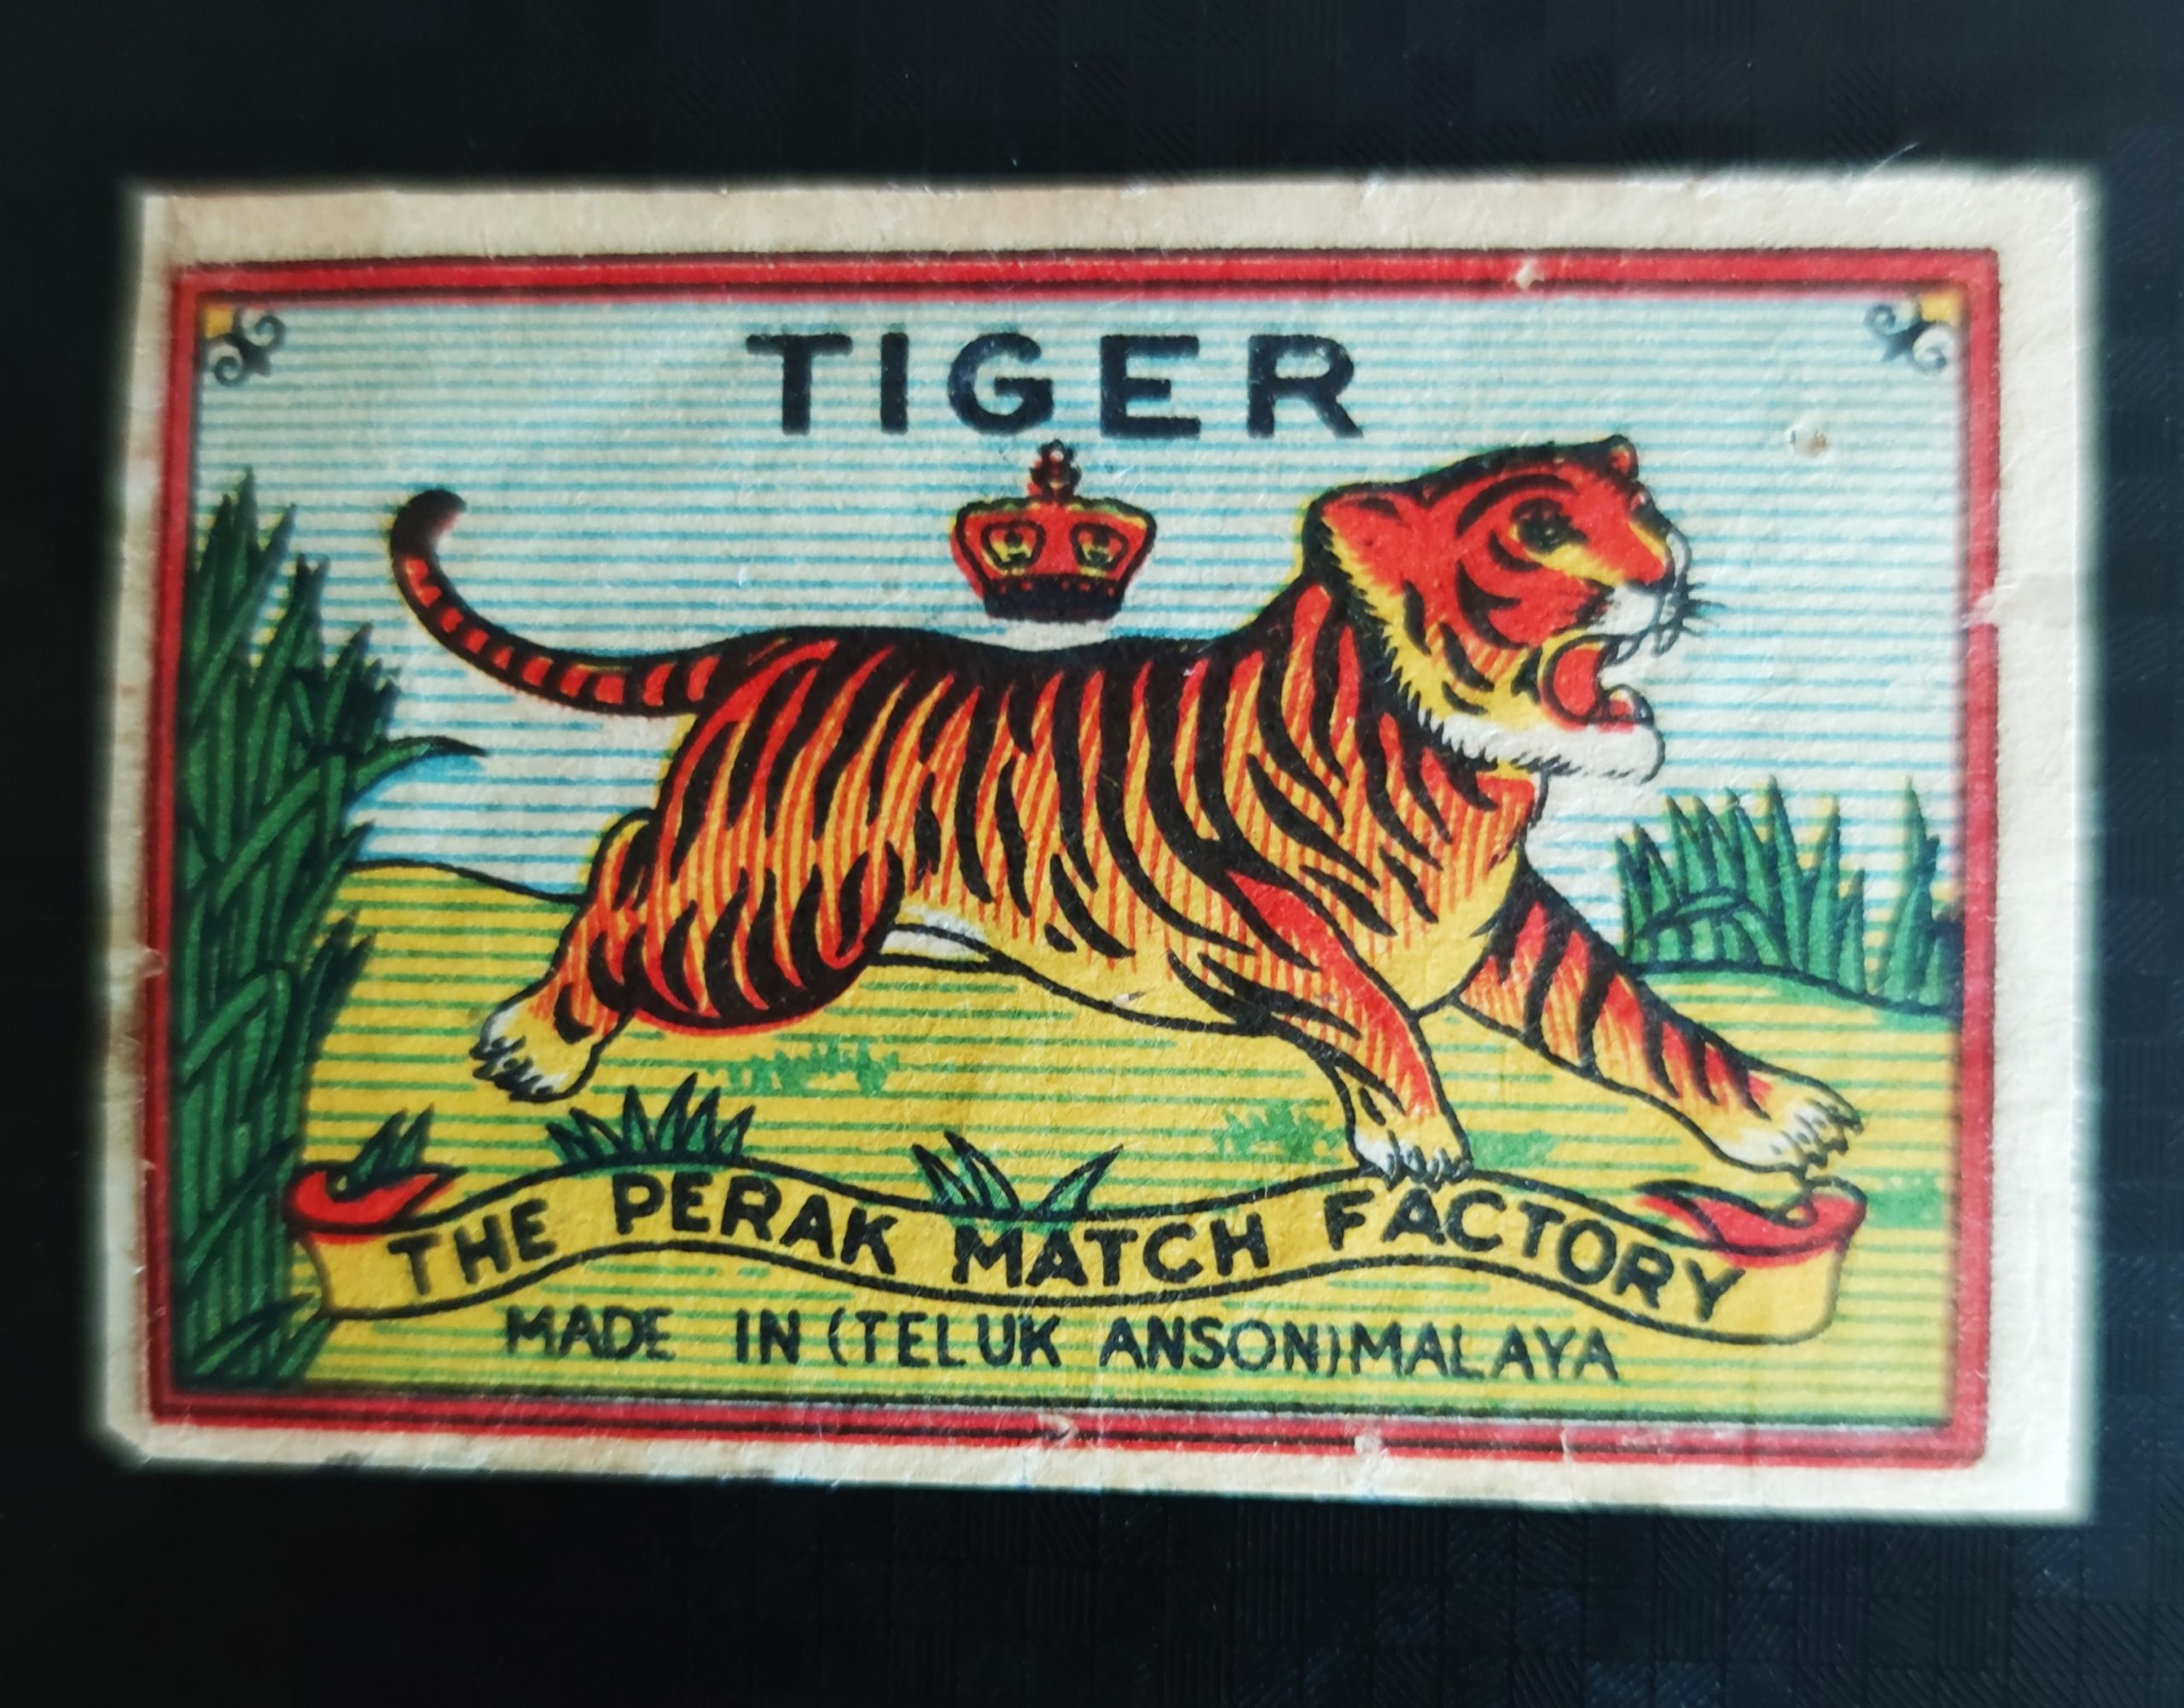 Tiger, 54 x 35 mm